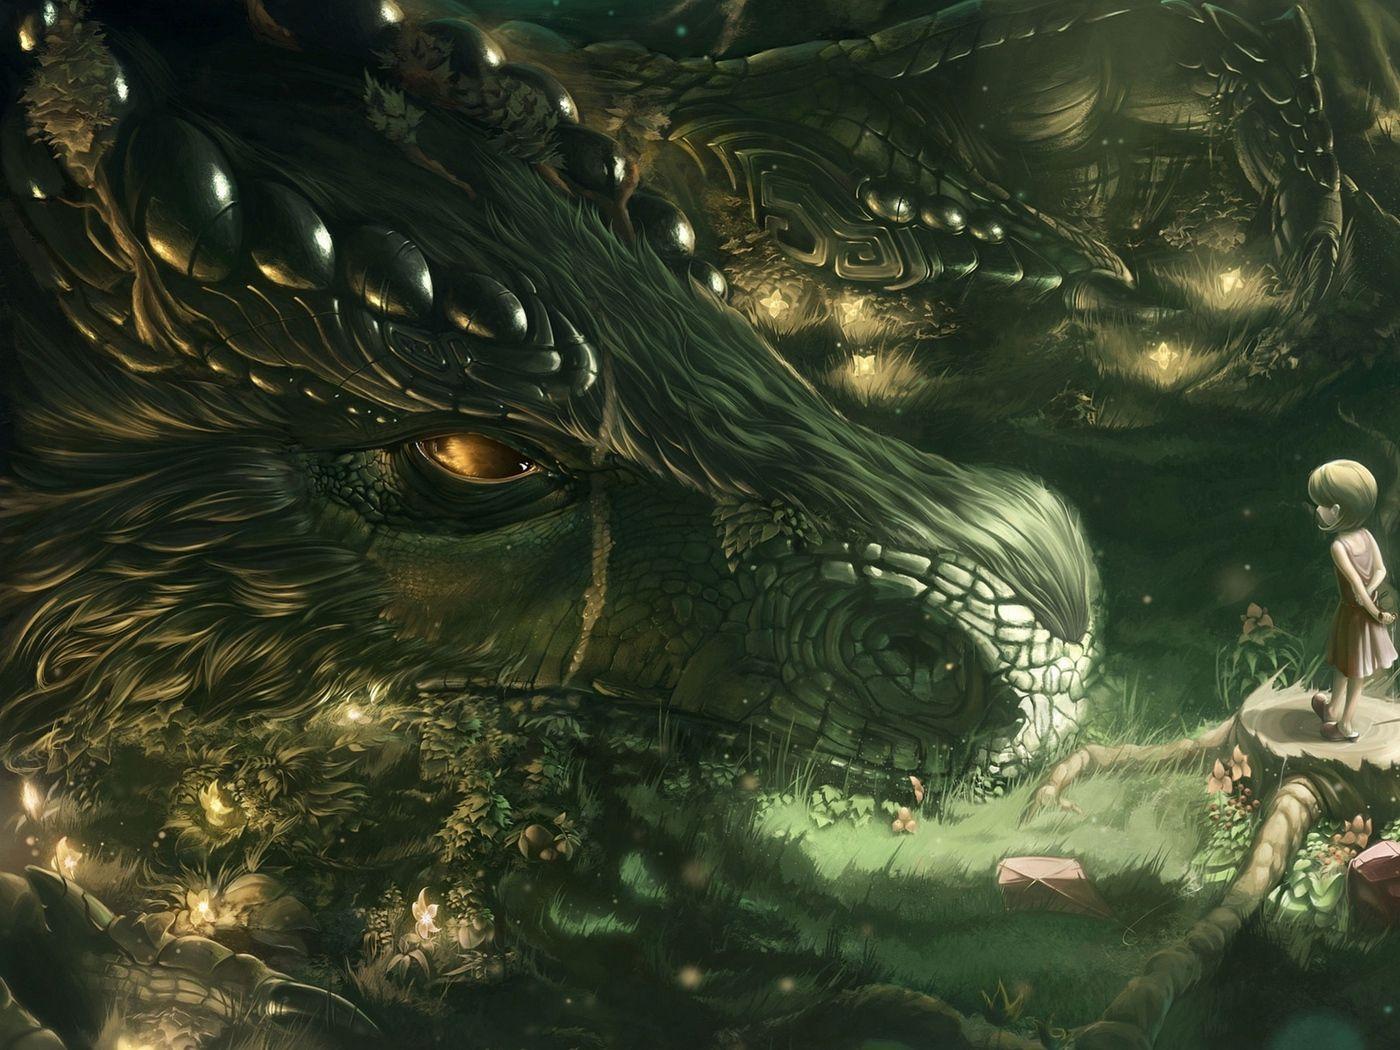 Dragon Girl Forest Art Wallpaper Beautiful Dragon Dragon Girl Fantasy Dragon